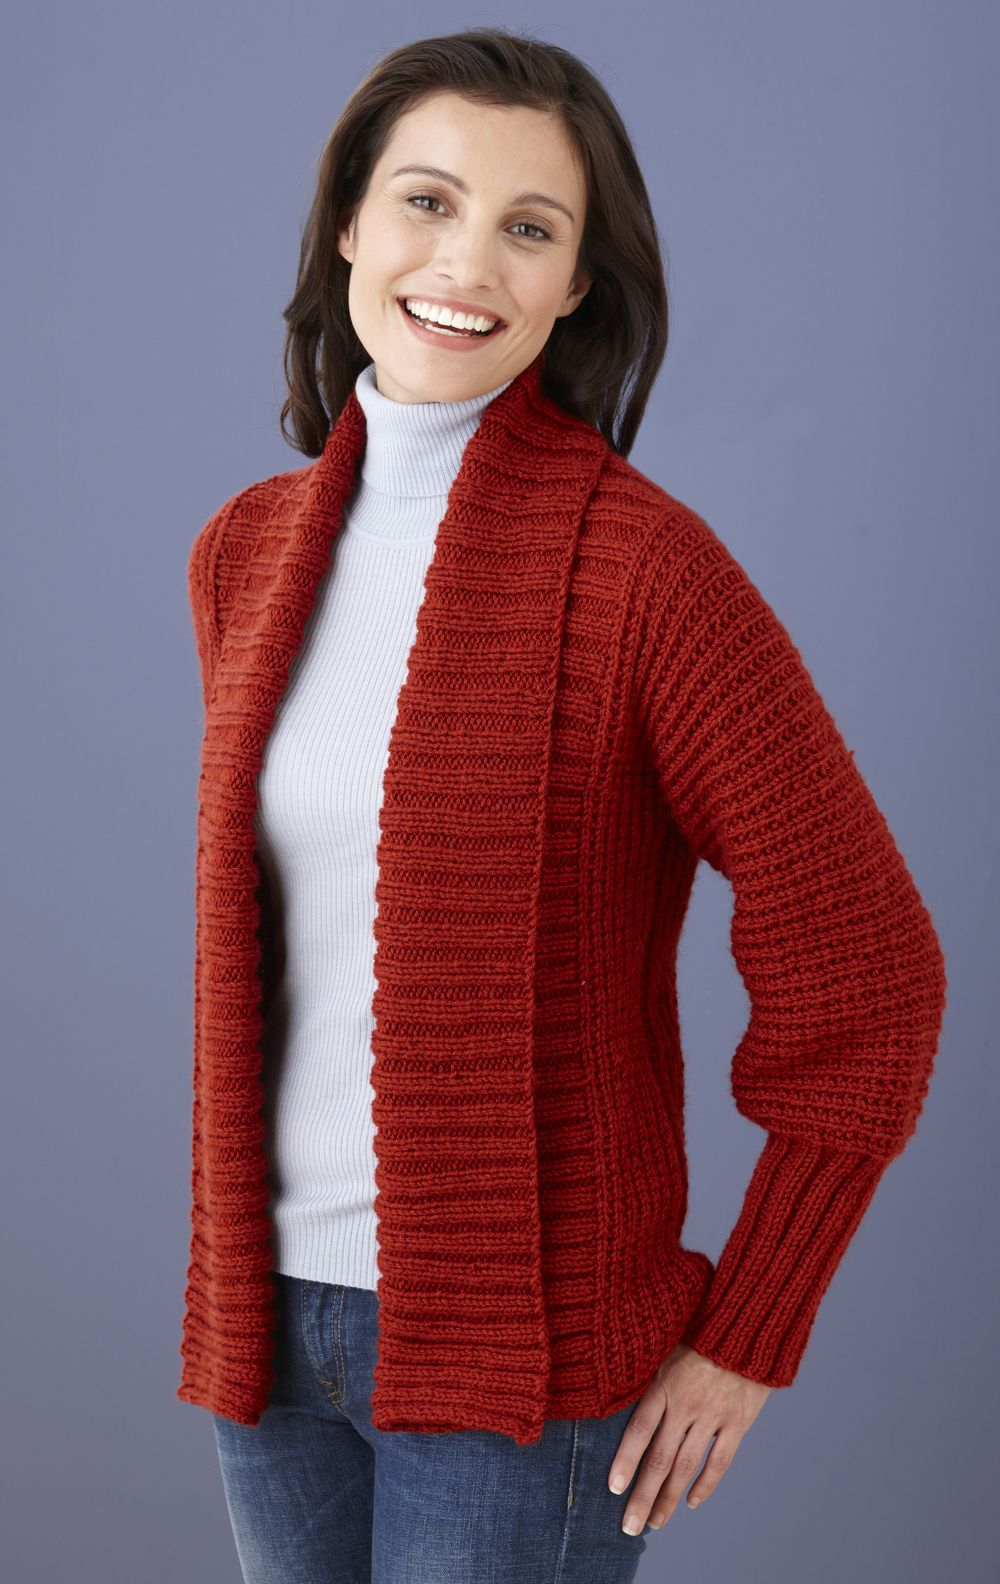 Easy drapey cardigan knit crochet sew craft pinterest easy drapey cardigan knit cardigan patterndrape bankloansurffo Choice Image